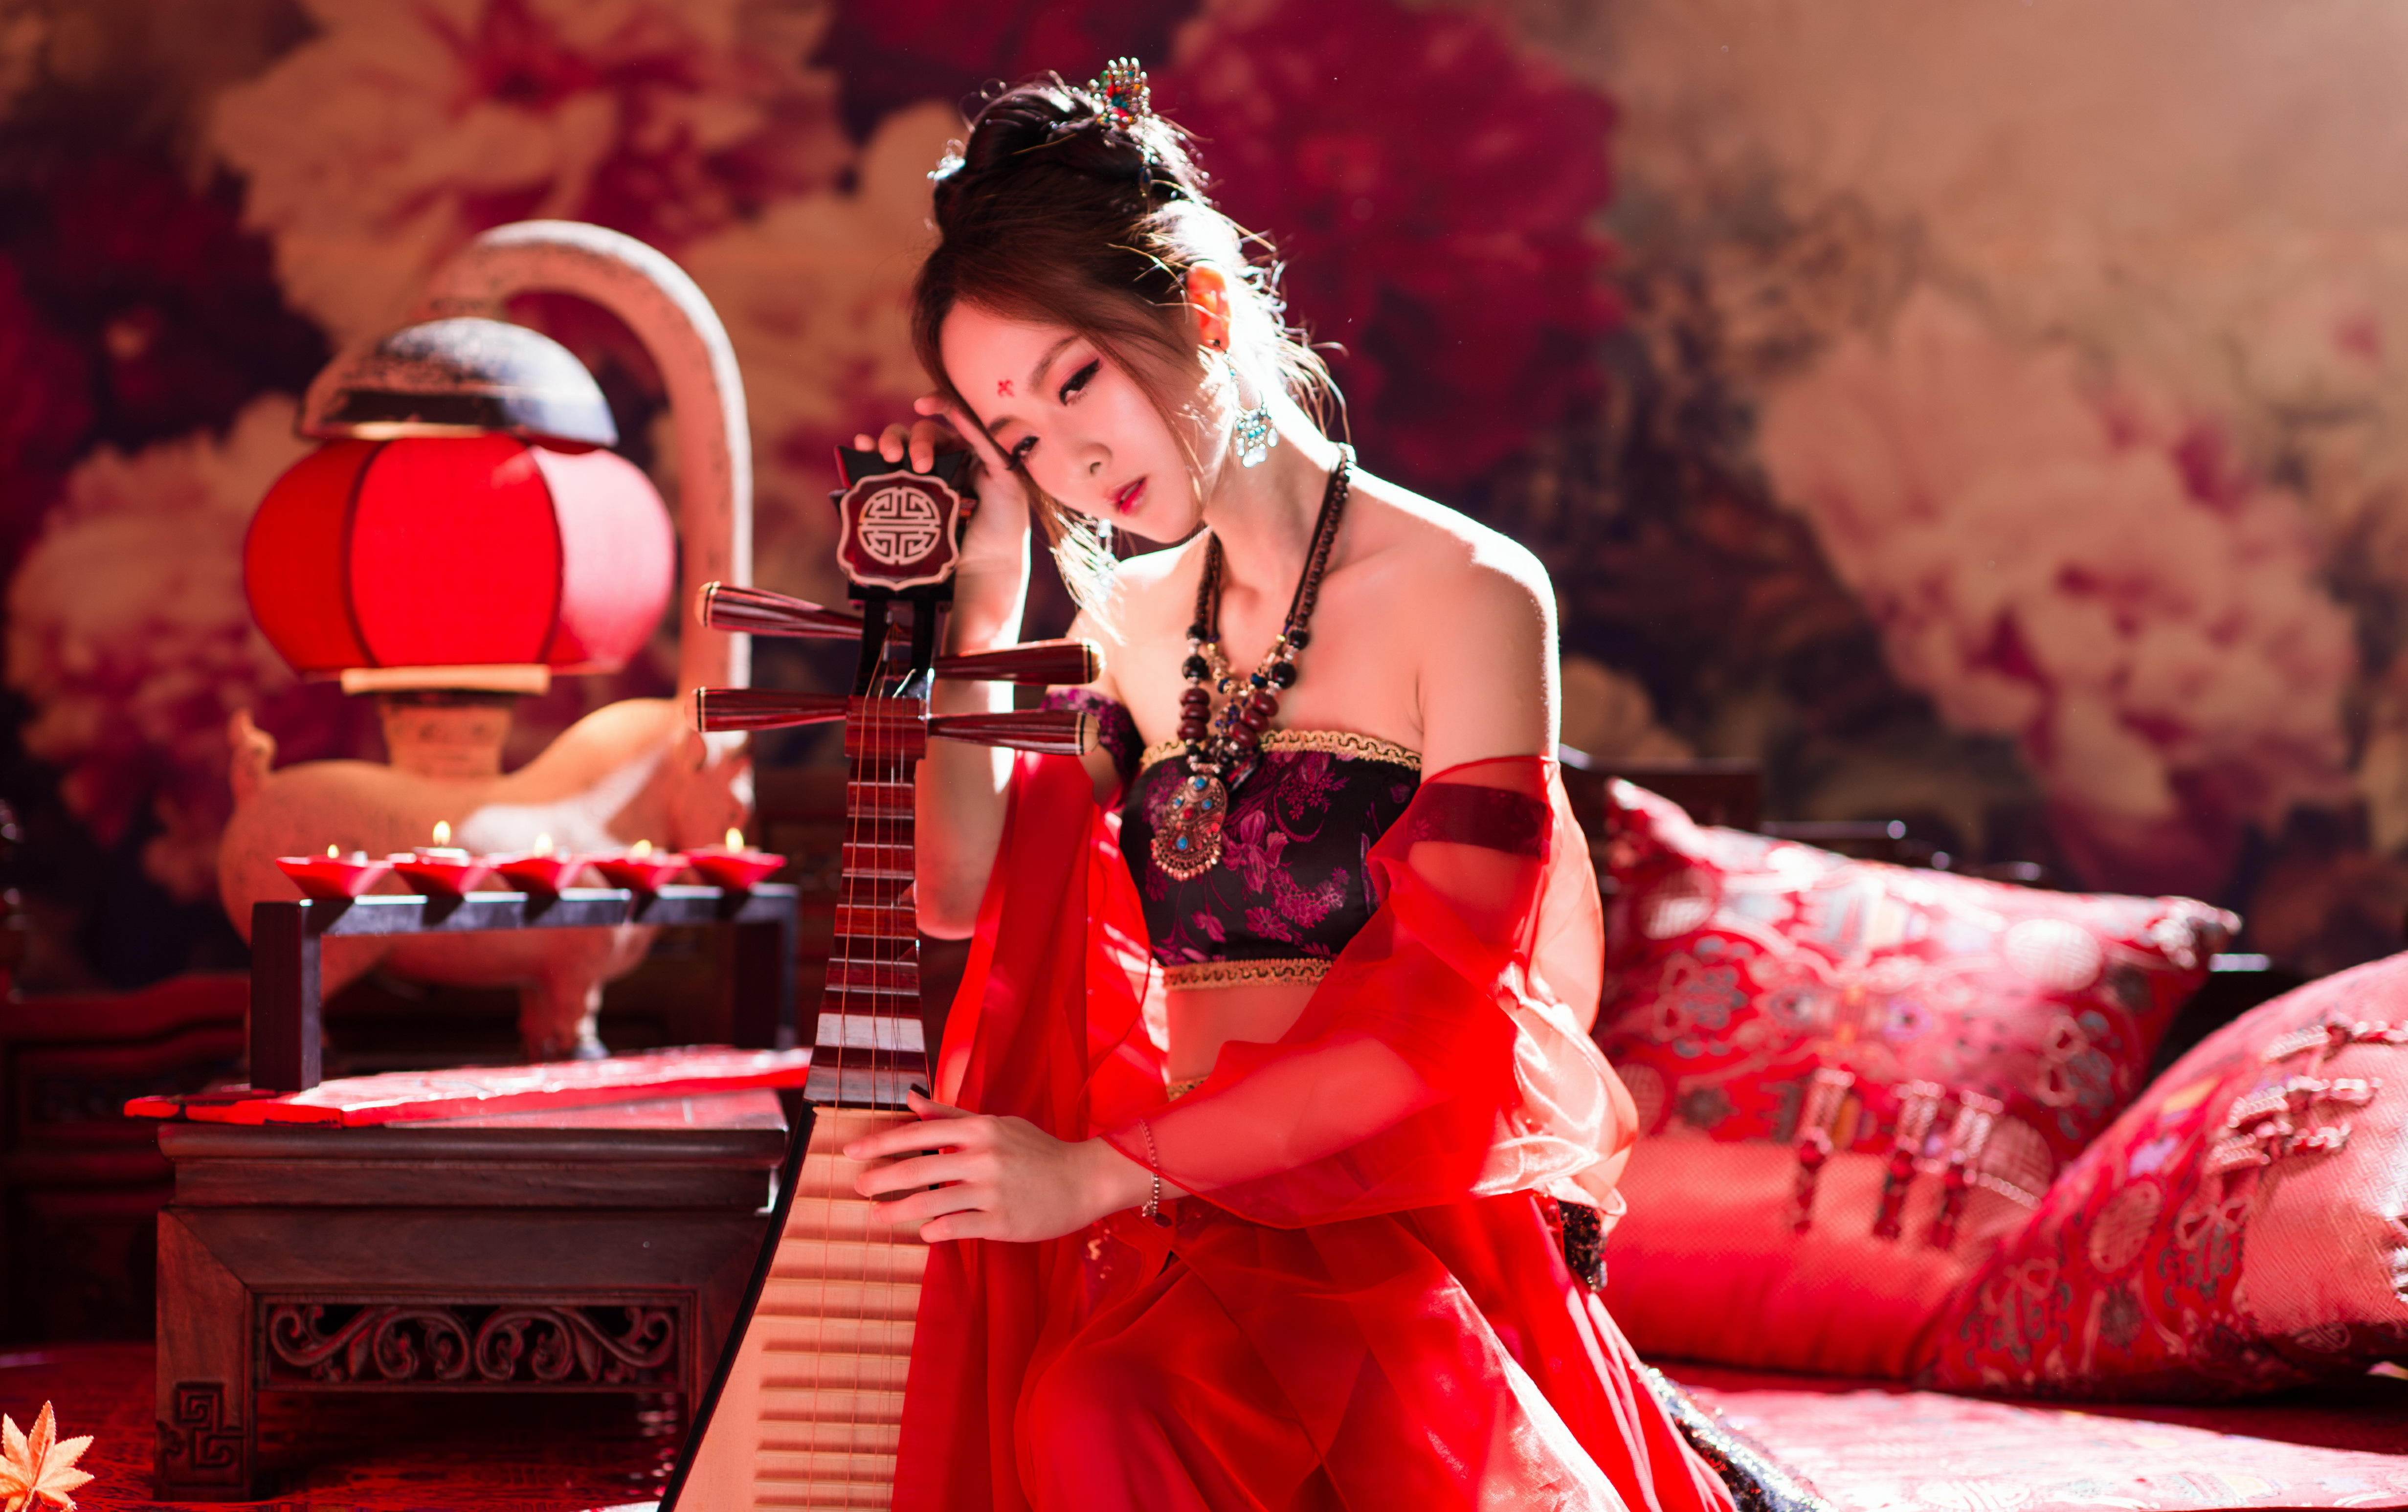 Mikako Zhang Kaijie 4k Ultra HD Wallpaper Background Image 4924x3092